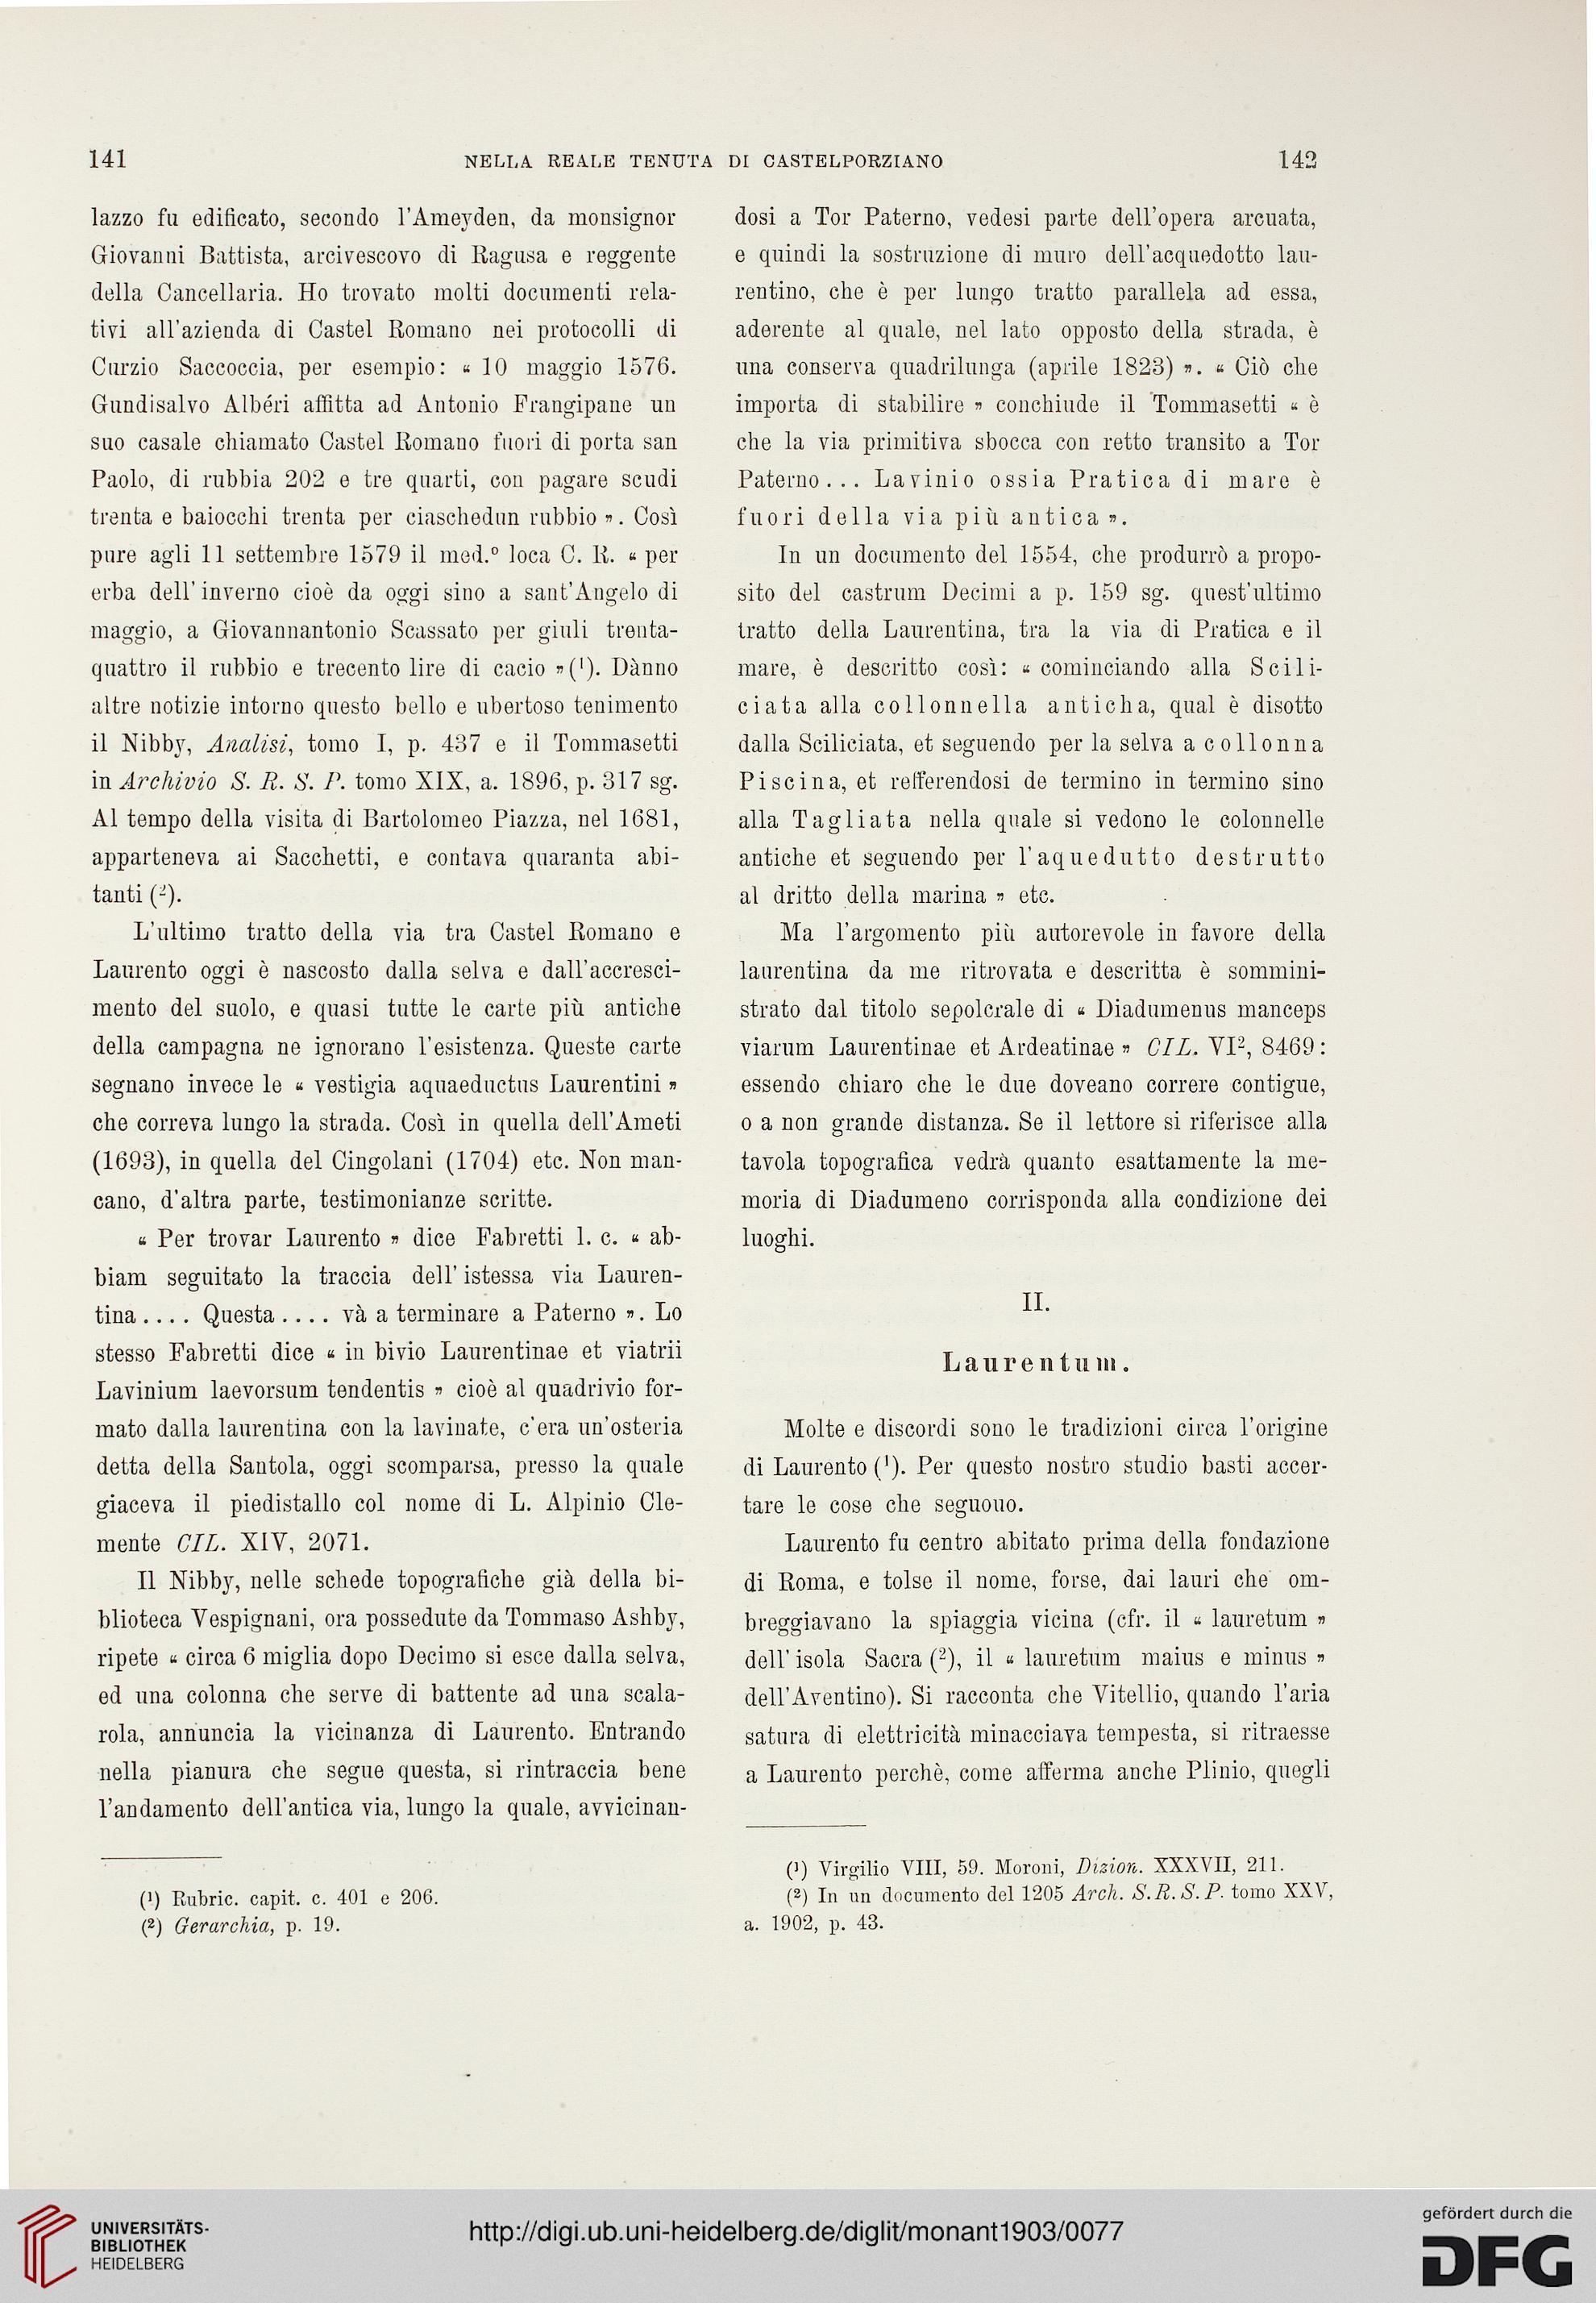 libreria arethusa roma - 28 images - arethusa libri libri scolastici ...